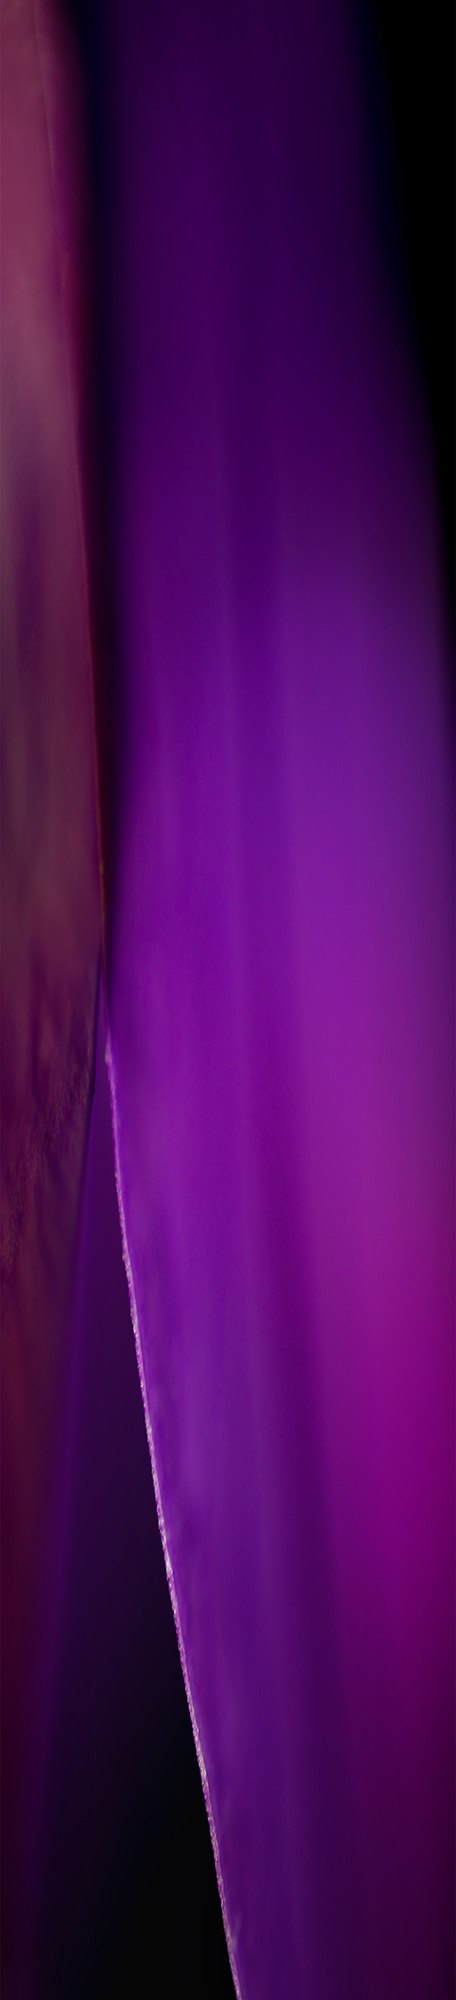 oikis01.jpg